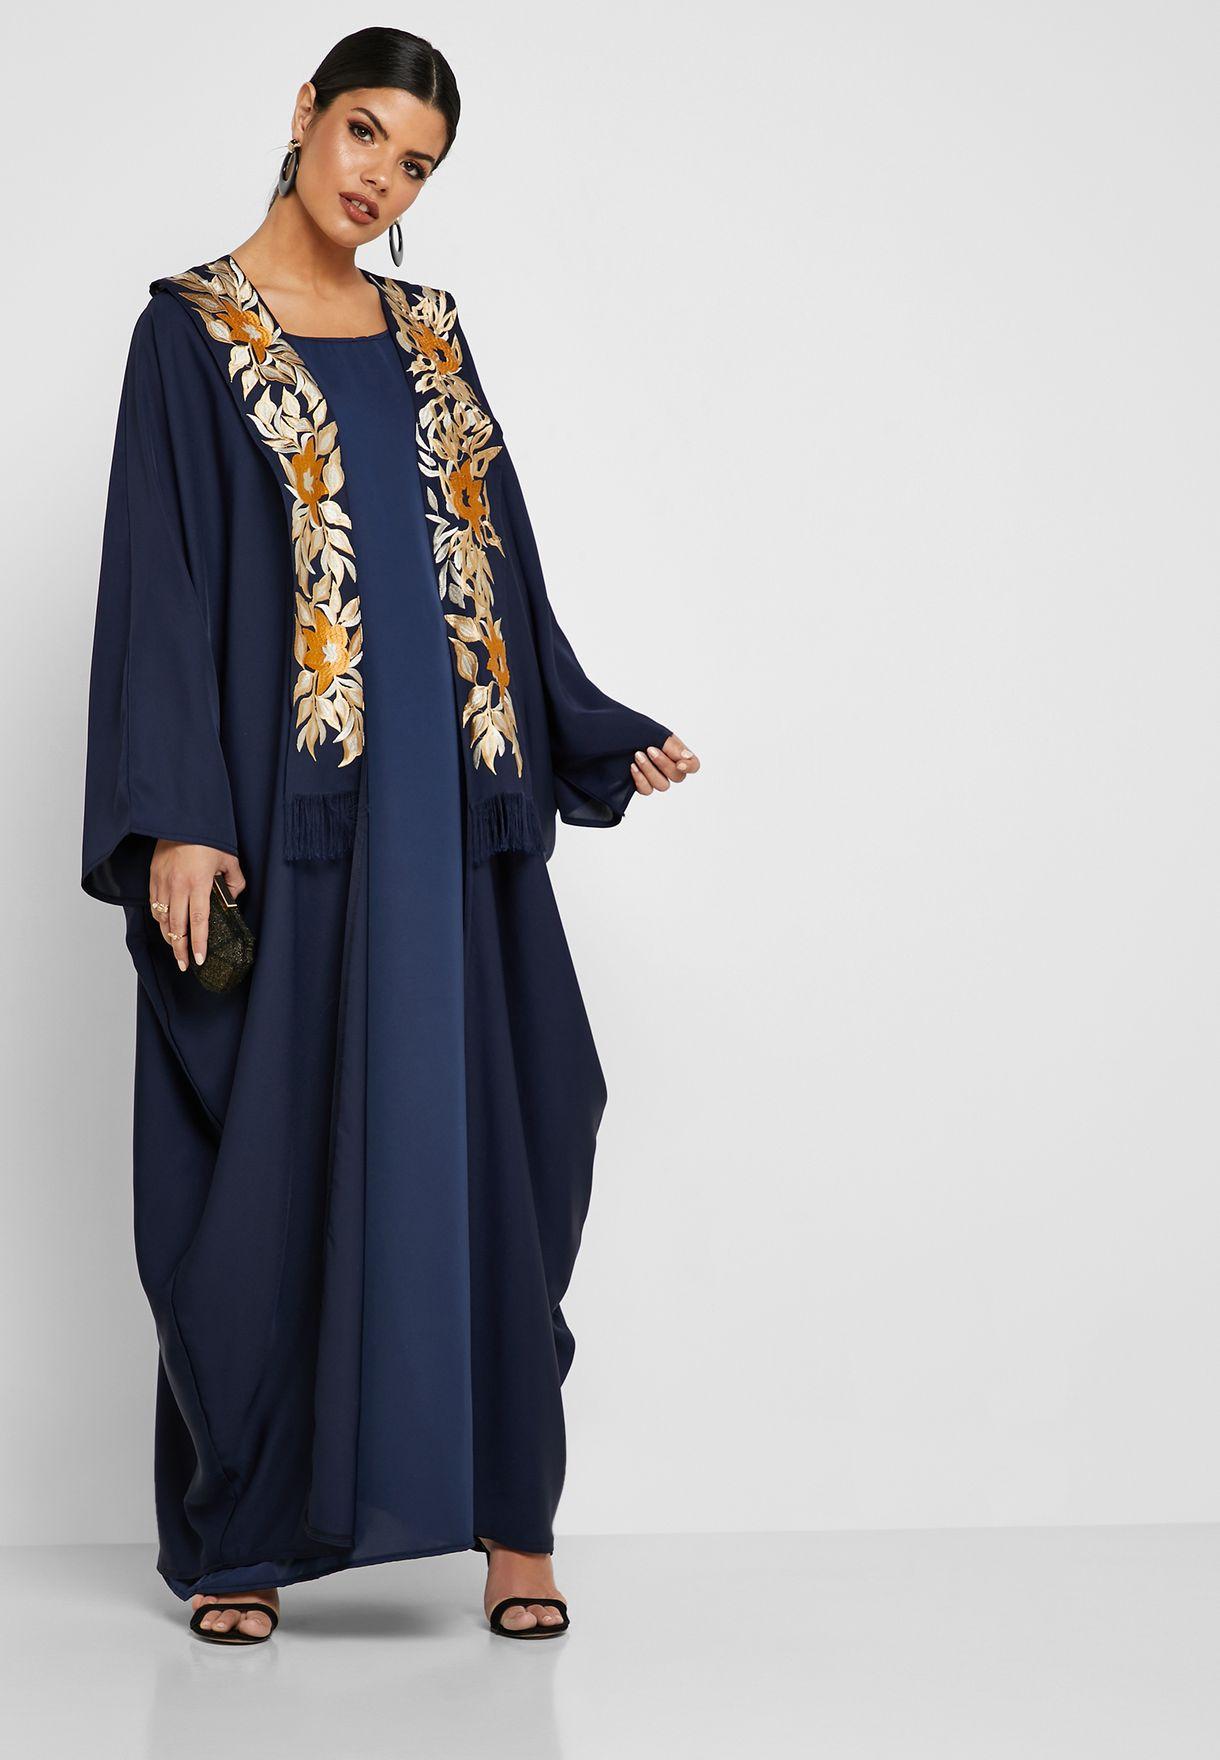 fb65a77ec93ab تسوق عباية وفستان مطرزة ماركة هيا كلوزيت لون كحلي awn - 161 في ...